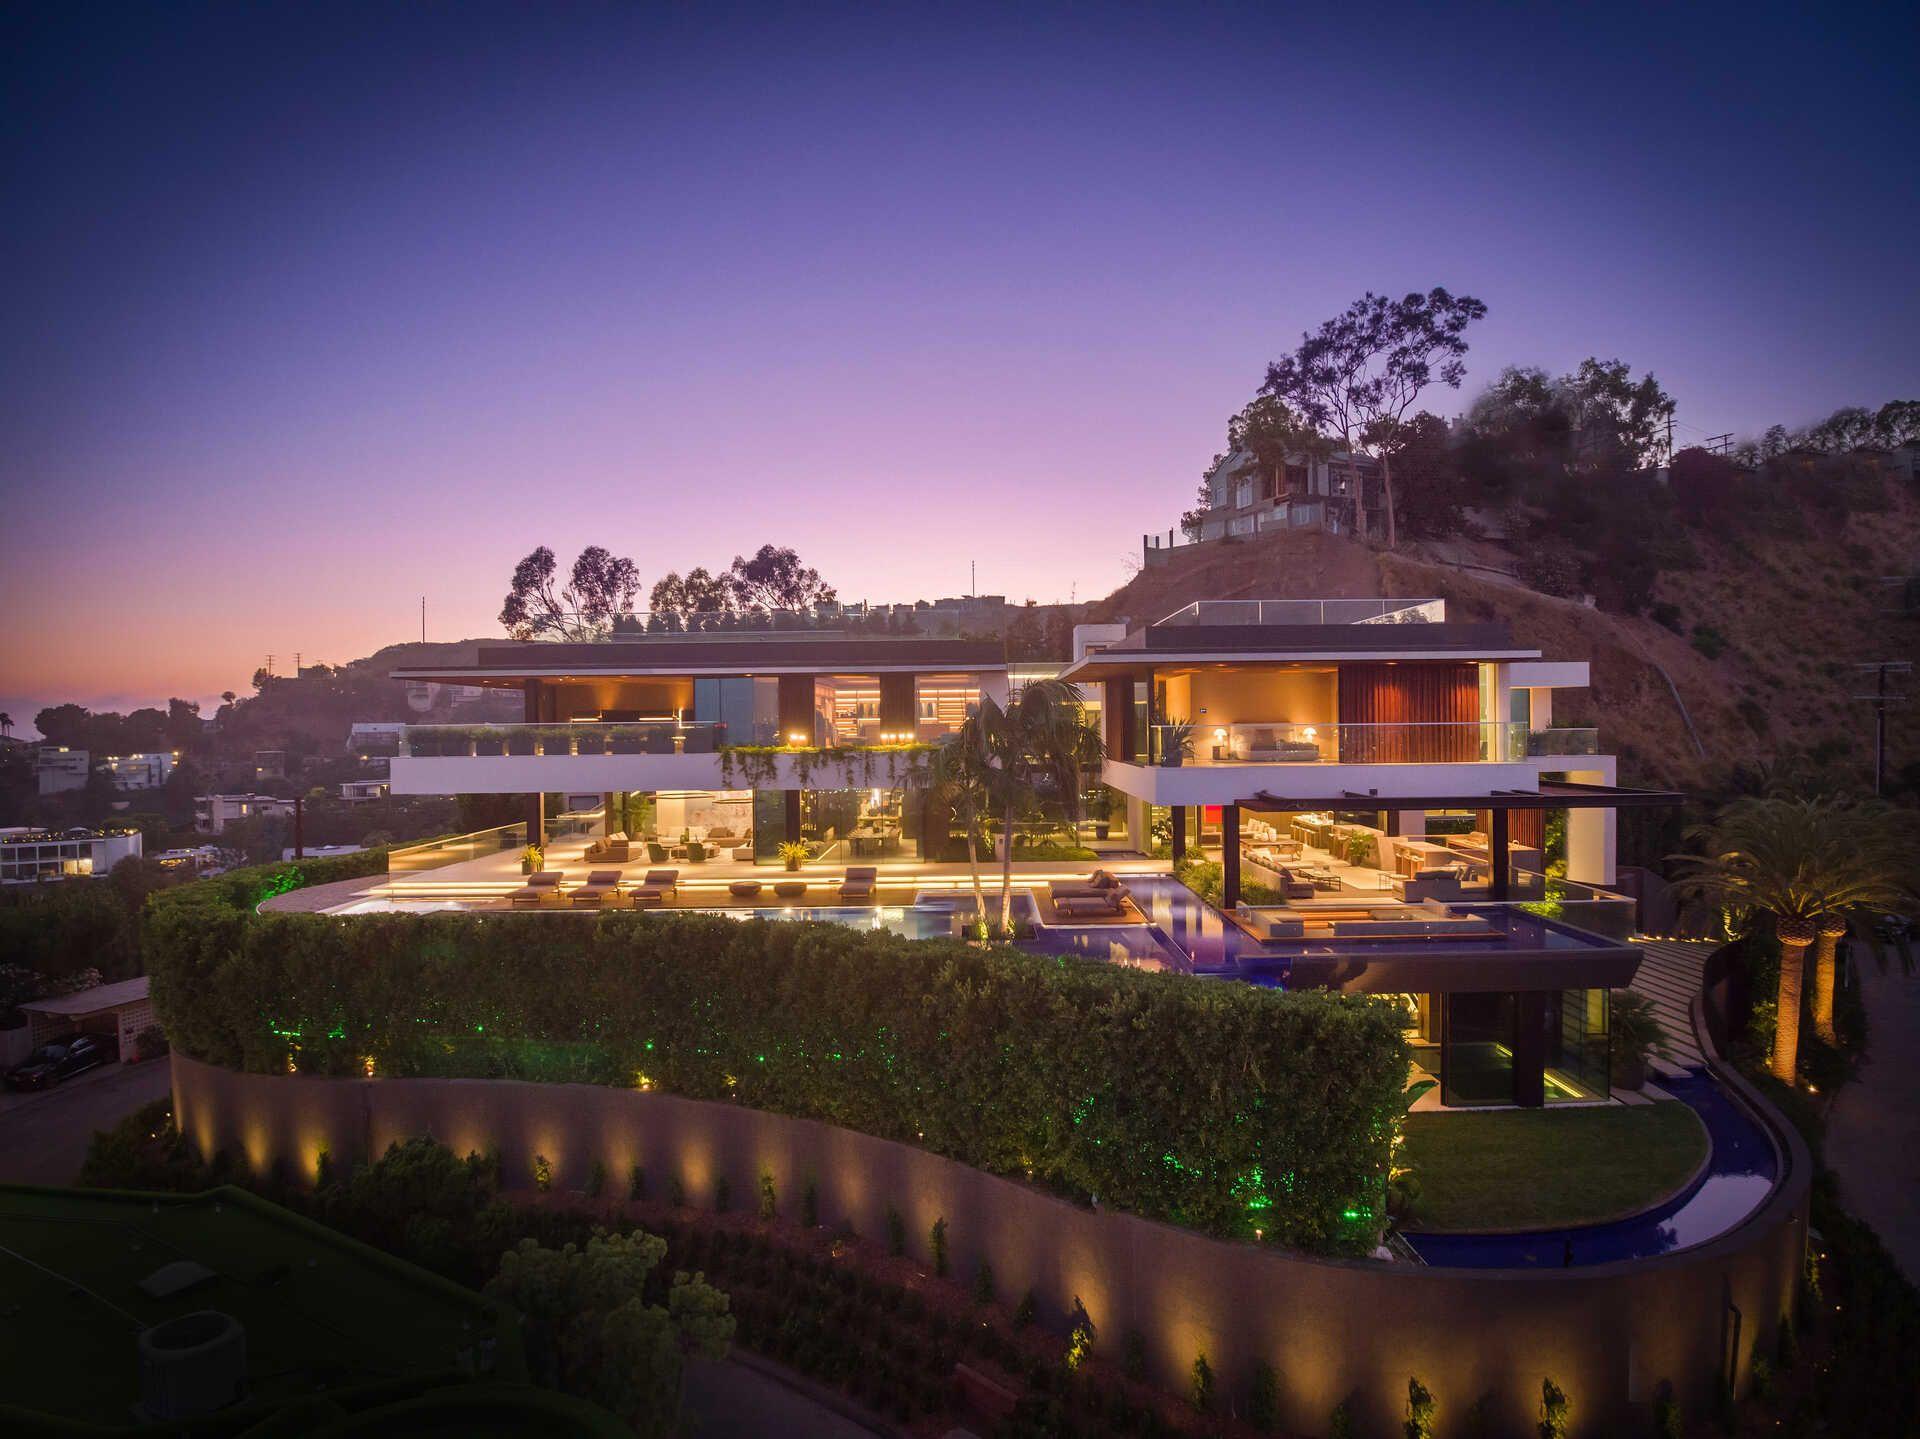 luxury home, luxury real estate, hollywood, los angeles